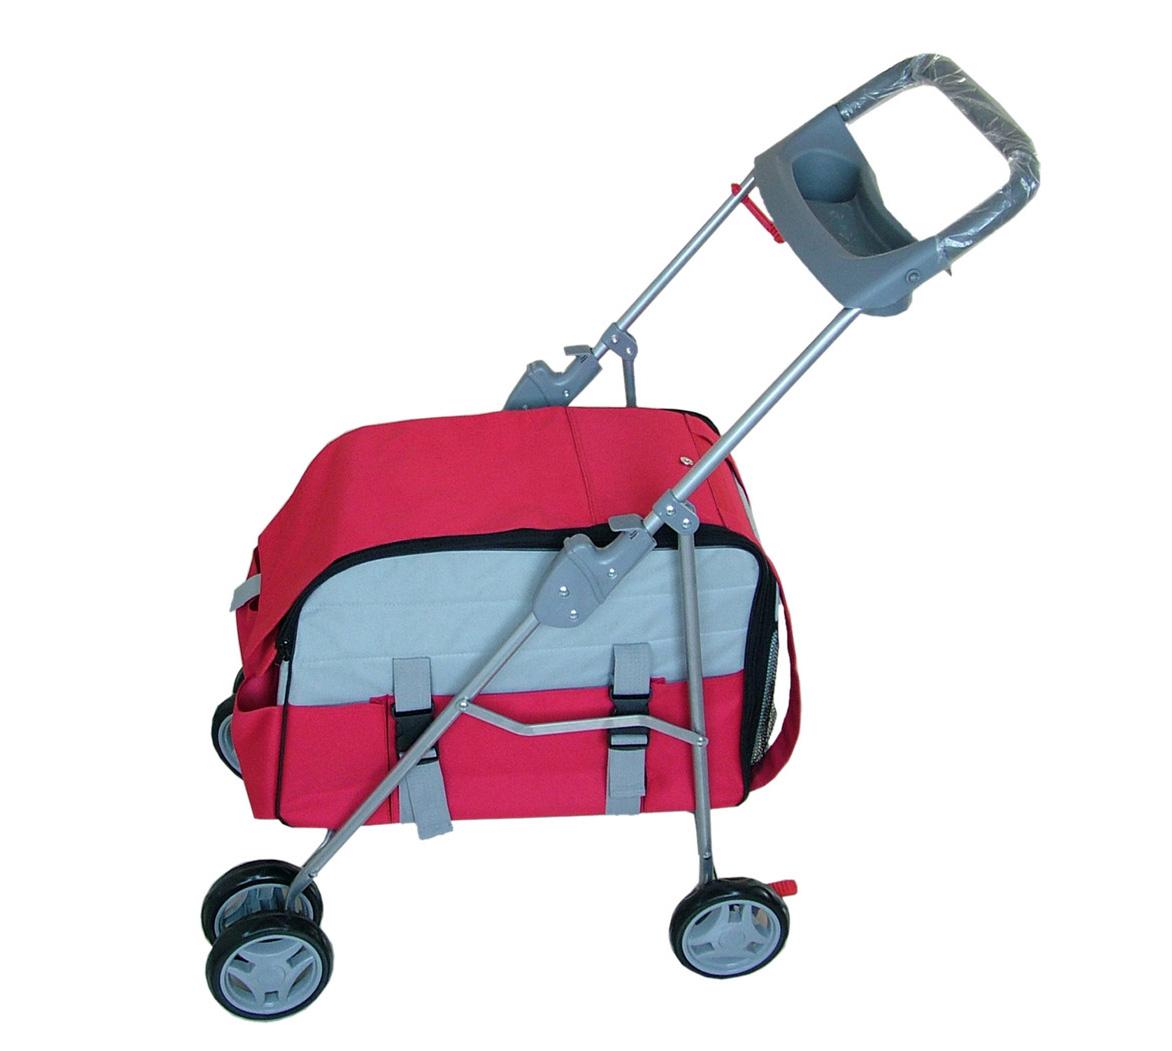 red or pink 3 in 1 stroller carrier car seat combo new ebay. Black Bedroom Furniture Sets. Home Design Ideas